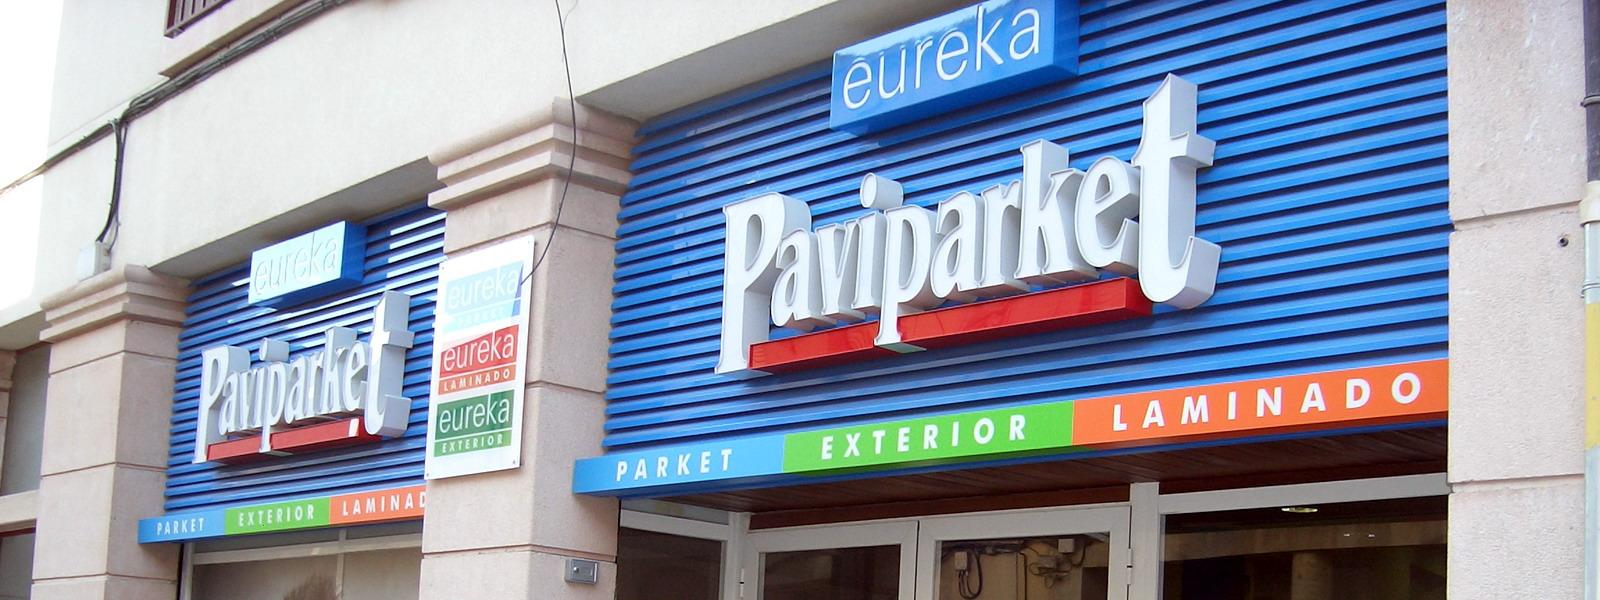 Paviparket